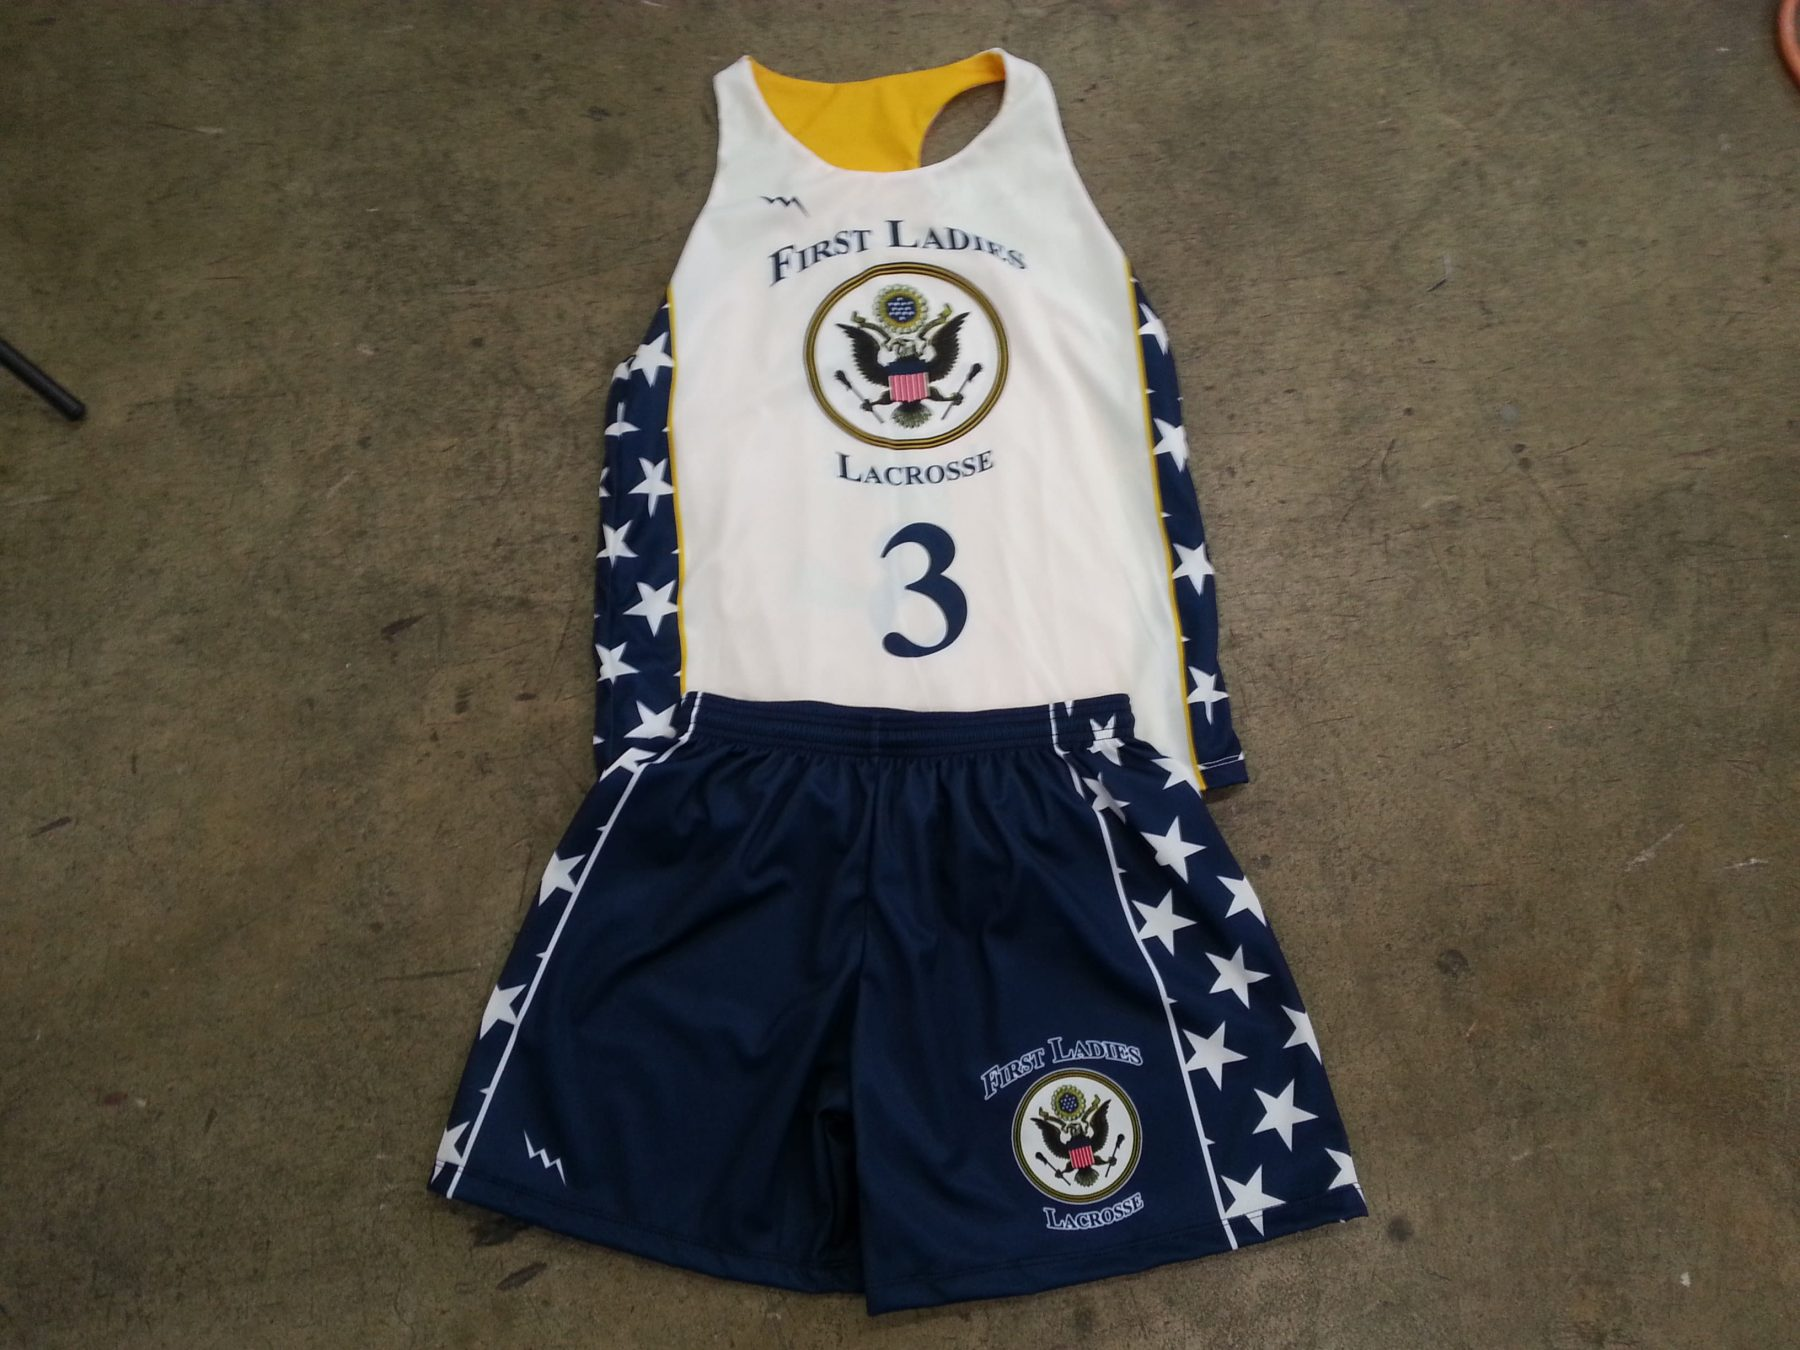 ladies lacrosse uniforms